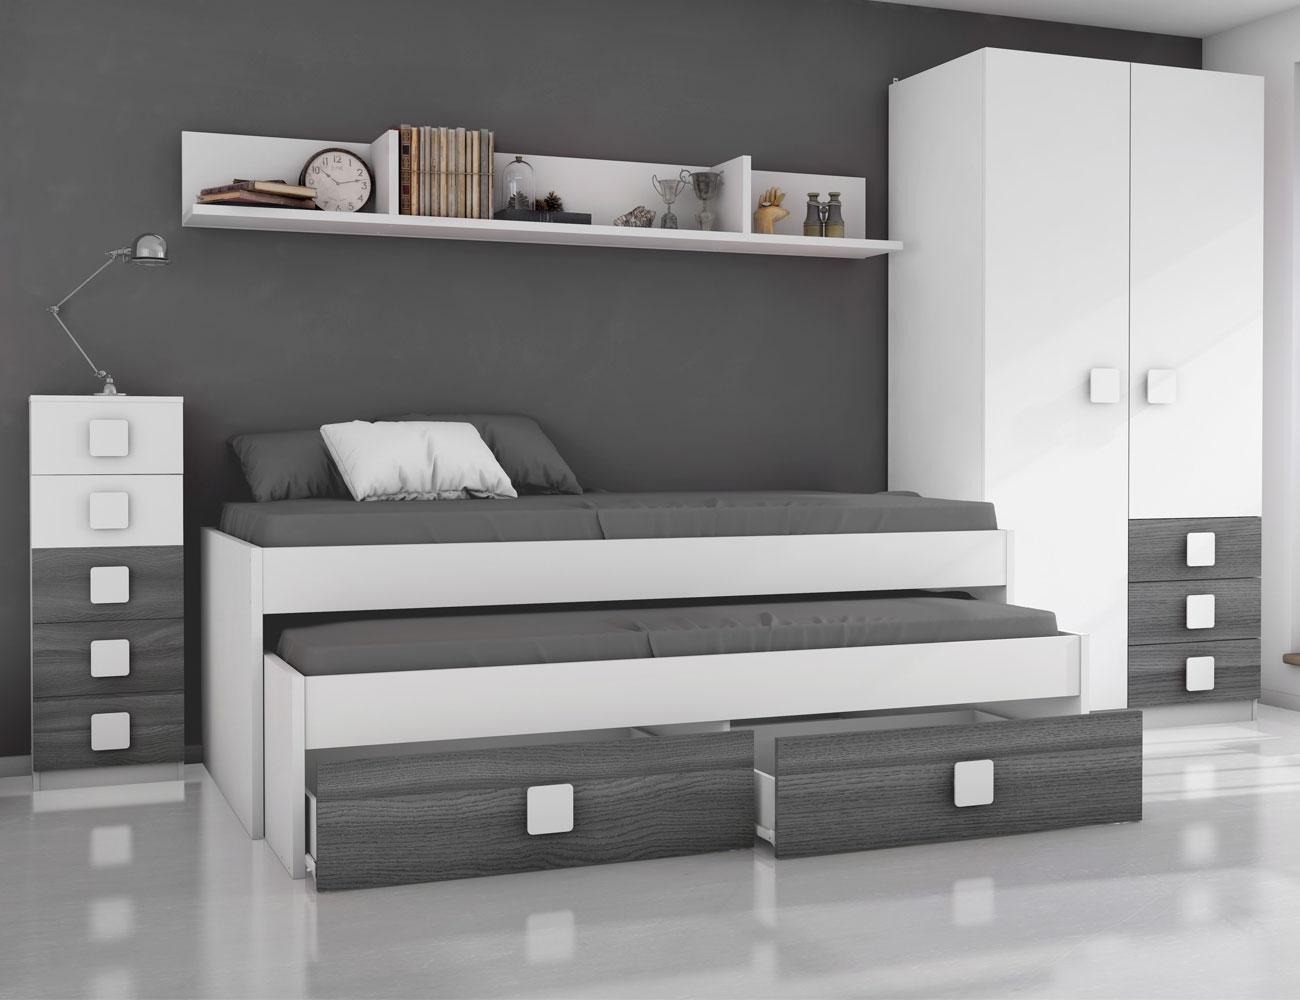 Dormitorio juvenil ceniza blanco5